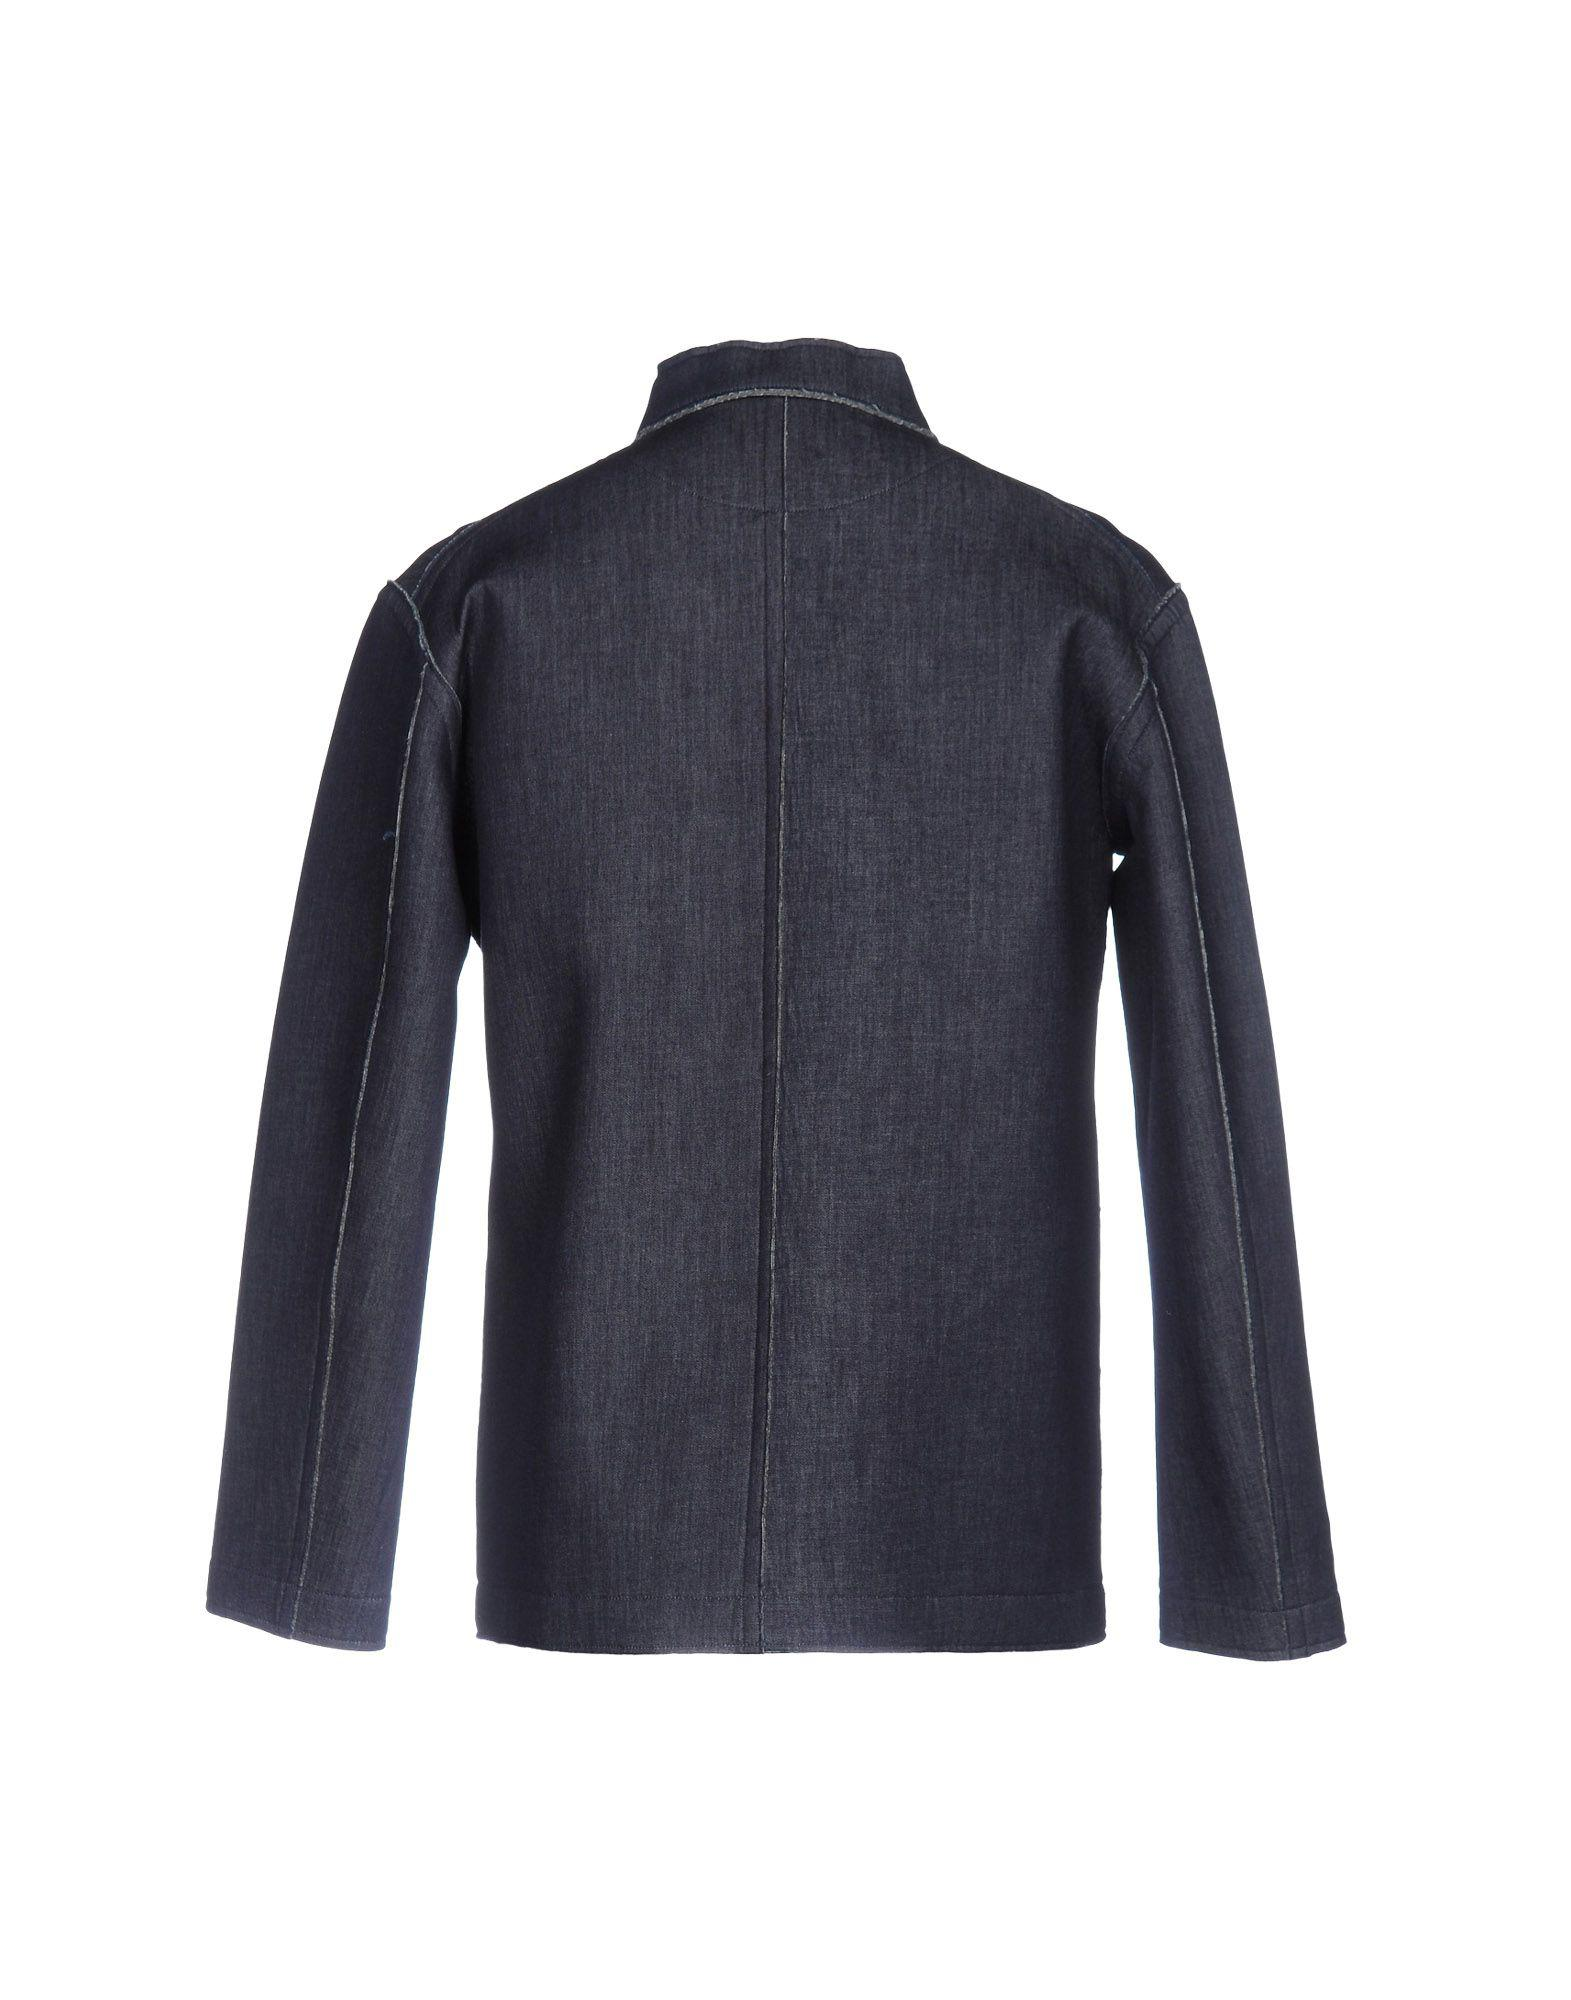 Julien David Neoprene Jacket in Dark Blue (Blue) for Men